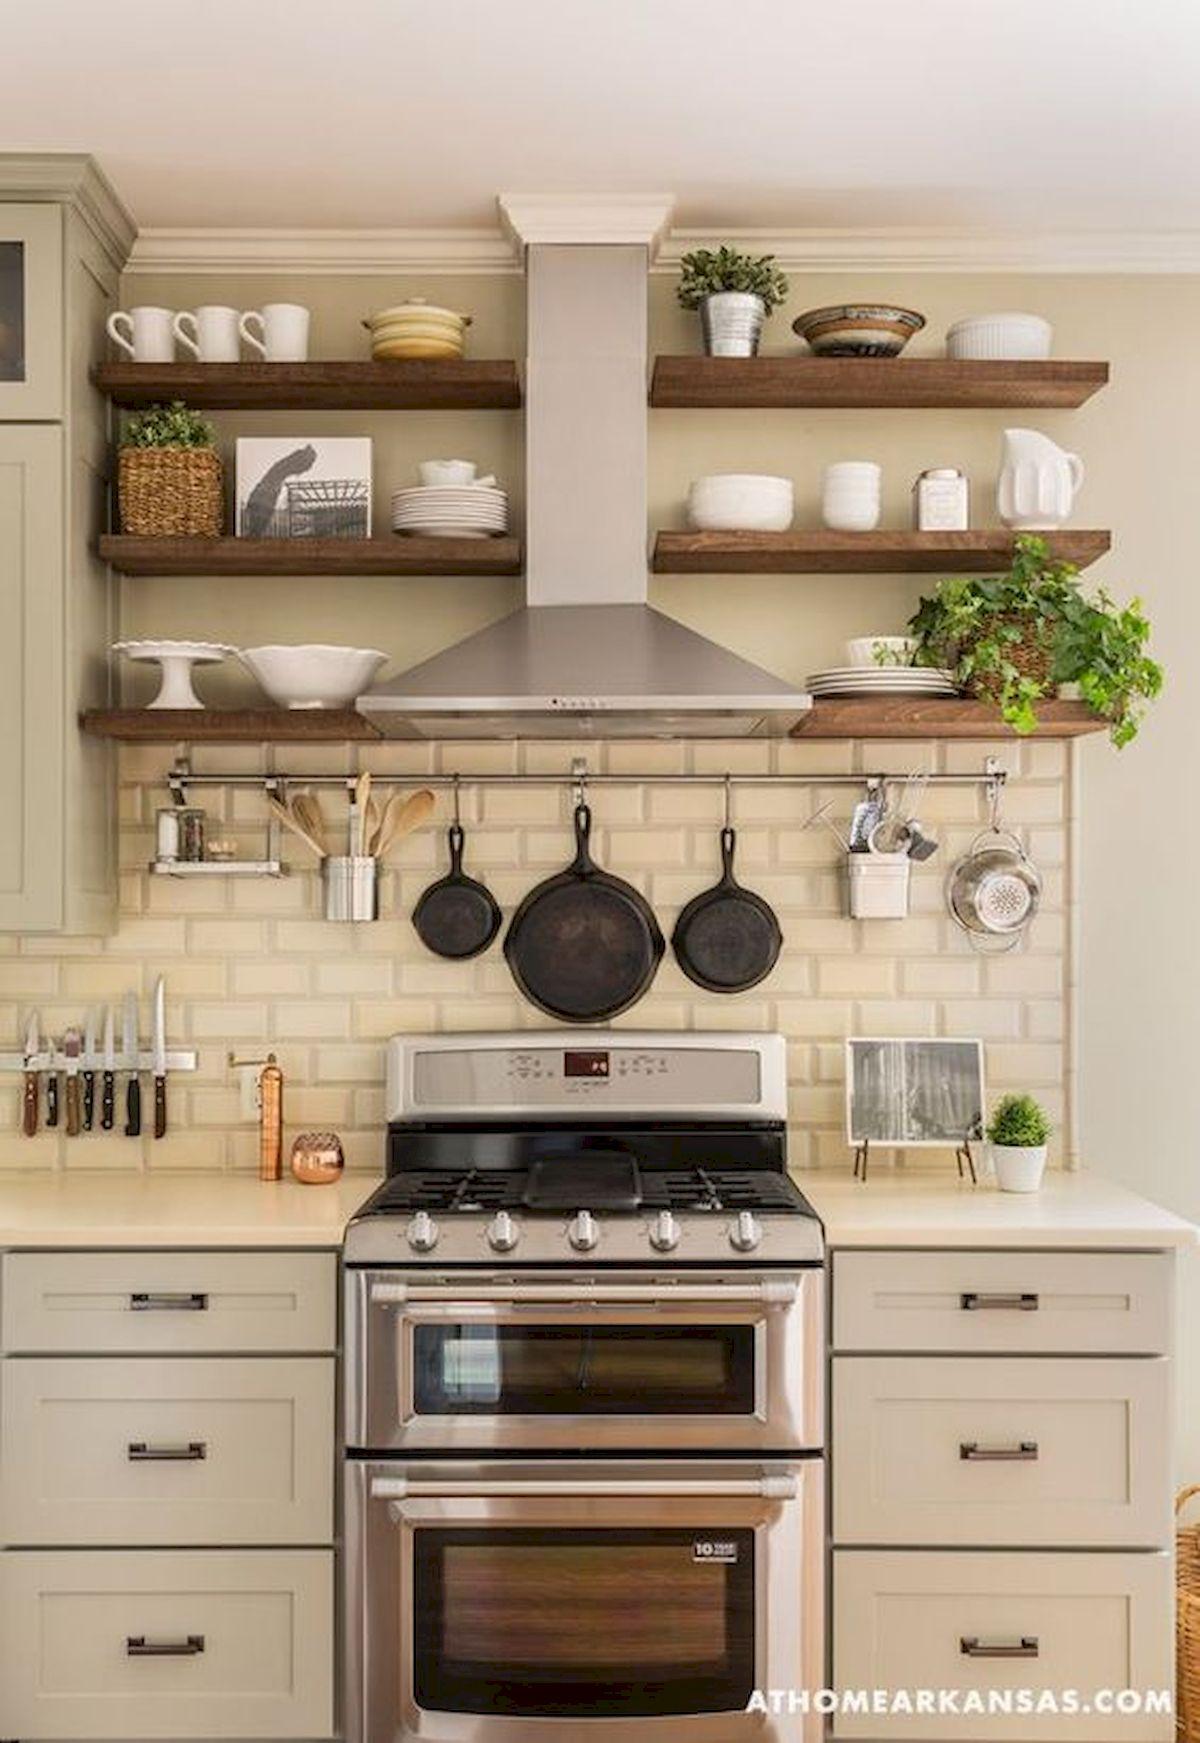 46 Easy DIY Kitchen Storage Ideas for Small Kitchen (28)